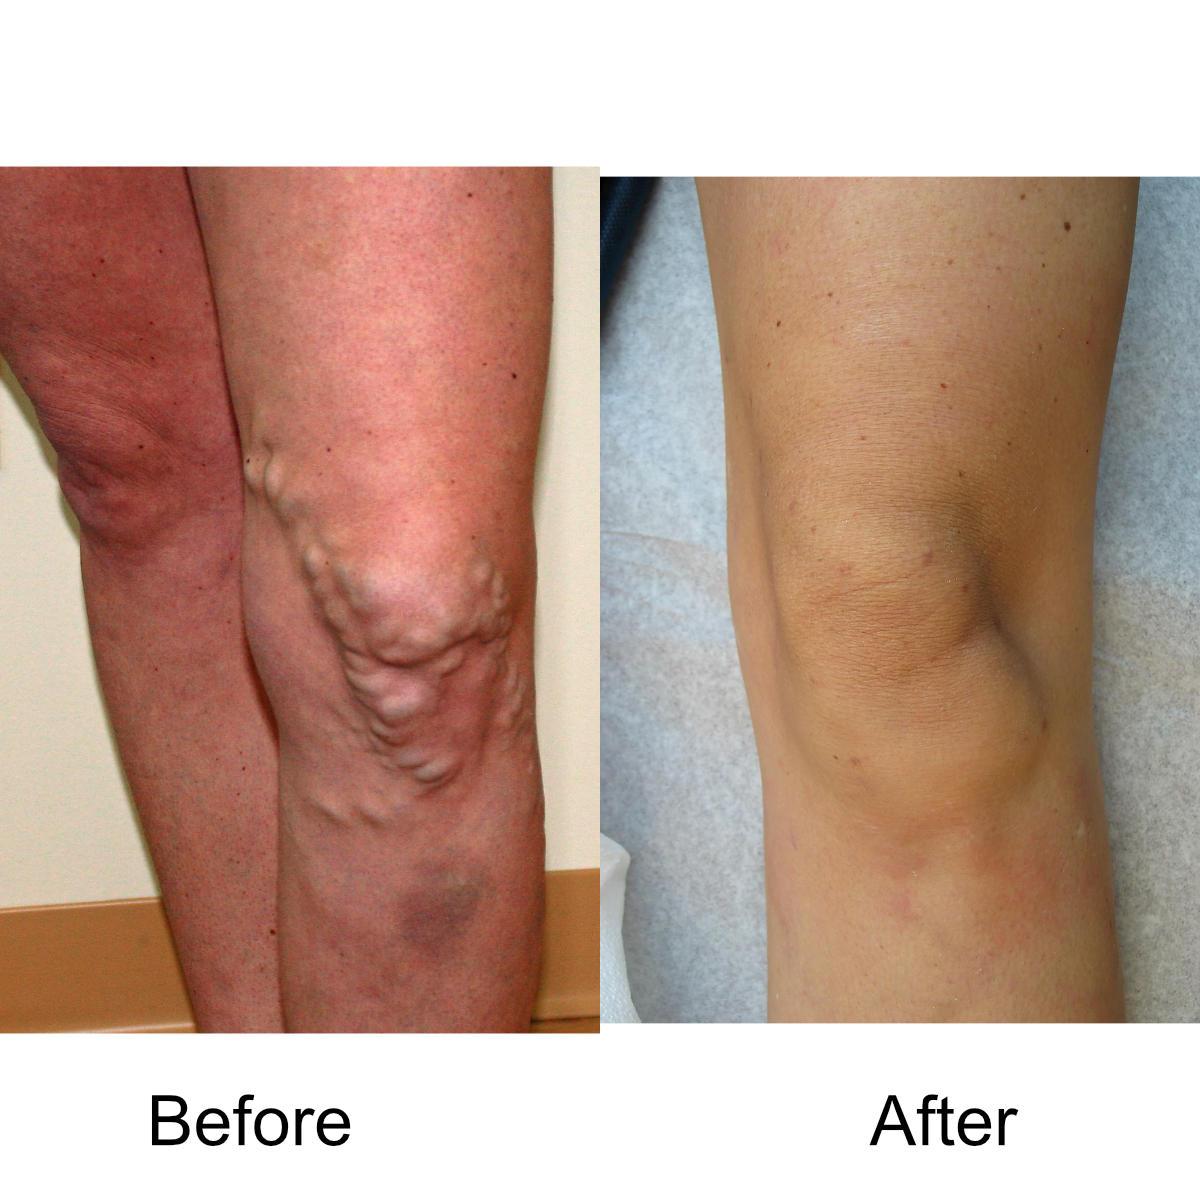 varicose-veins-comparison-15